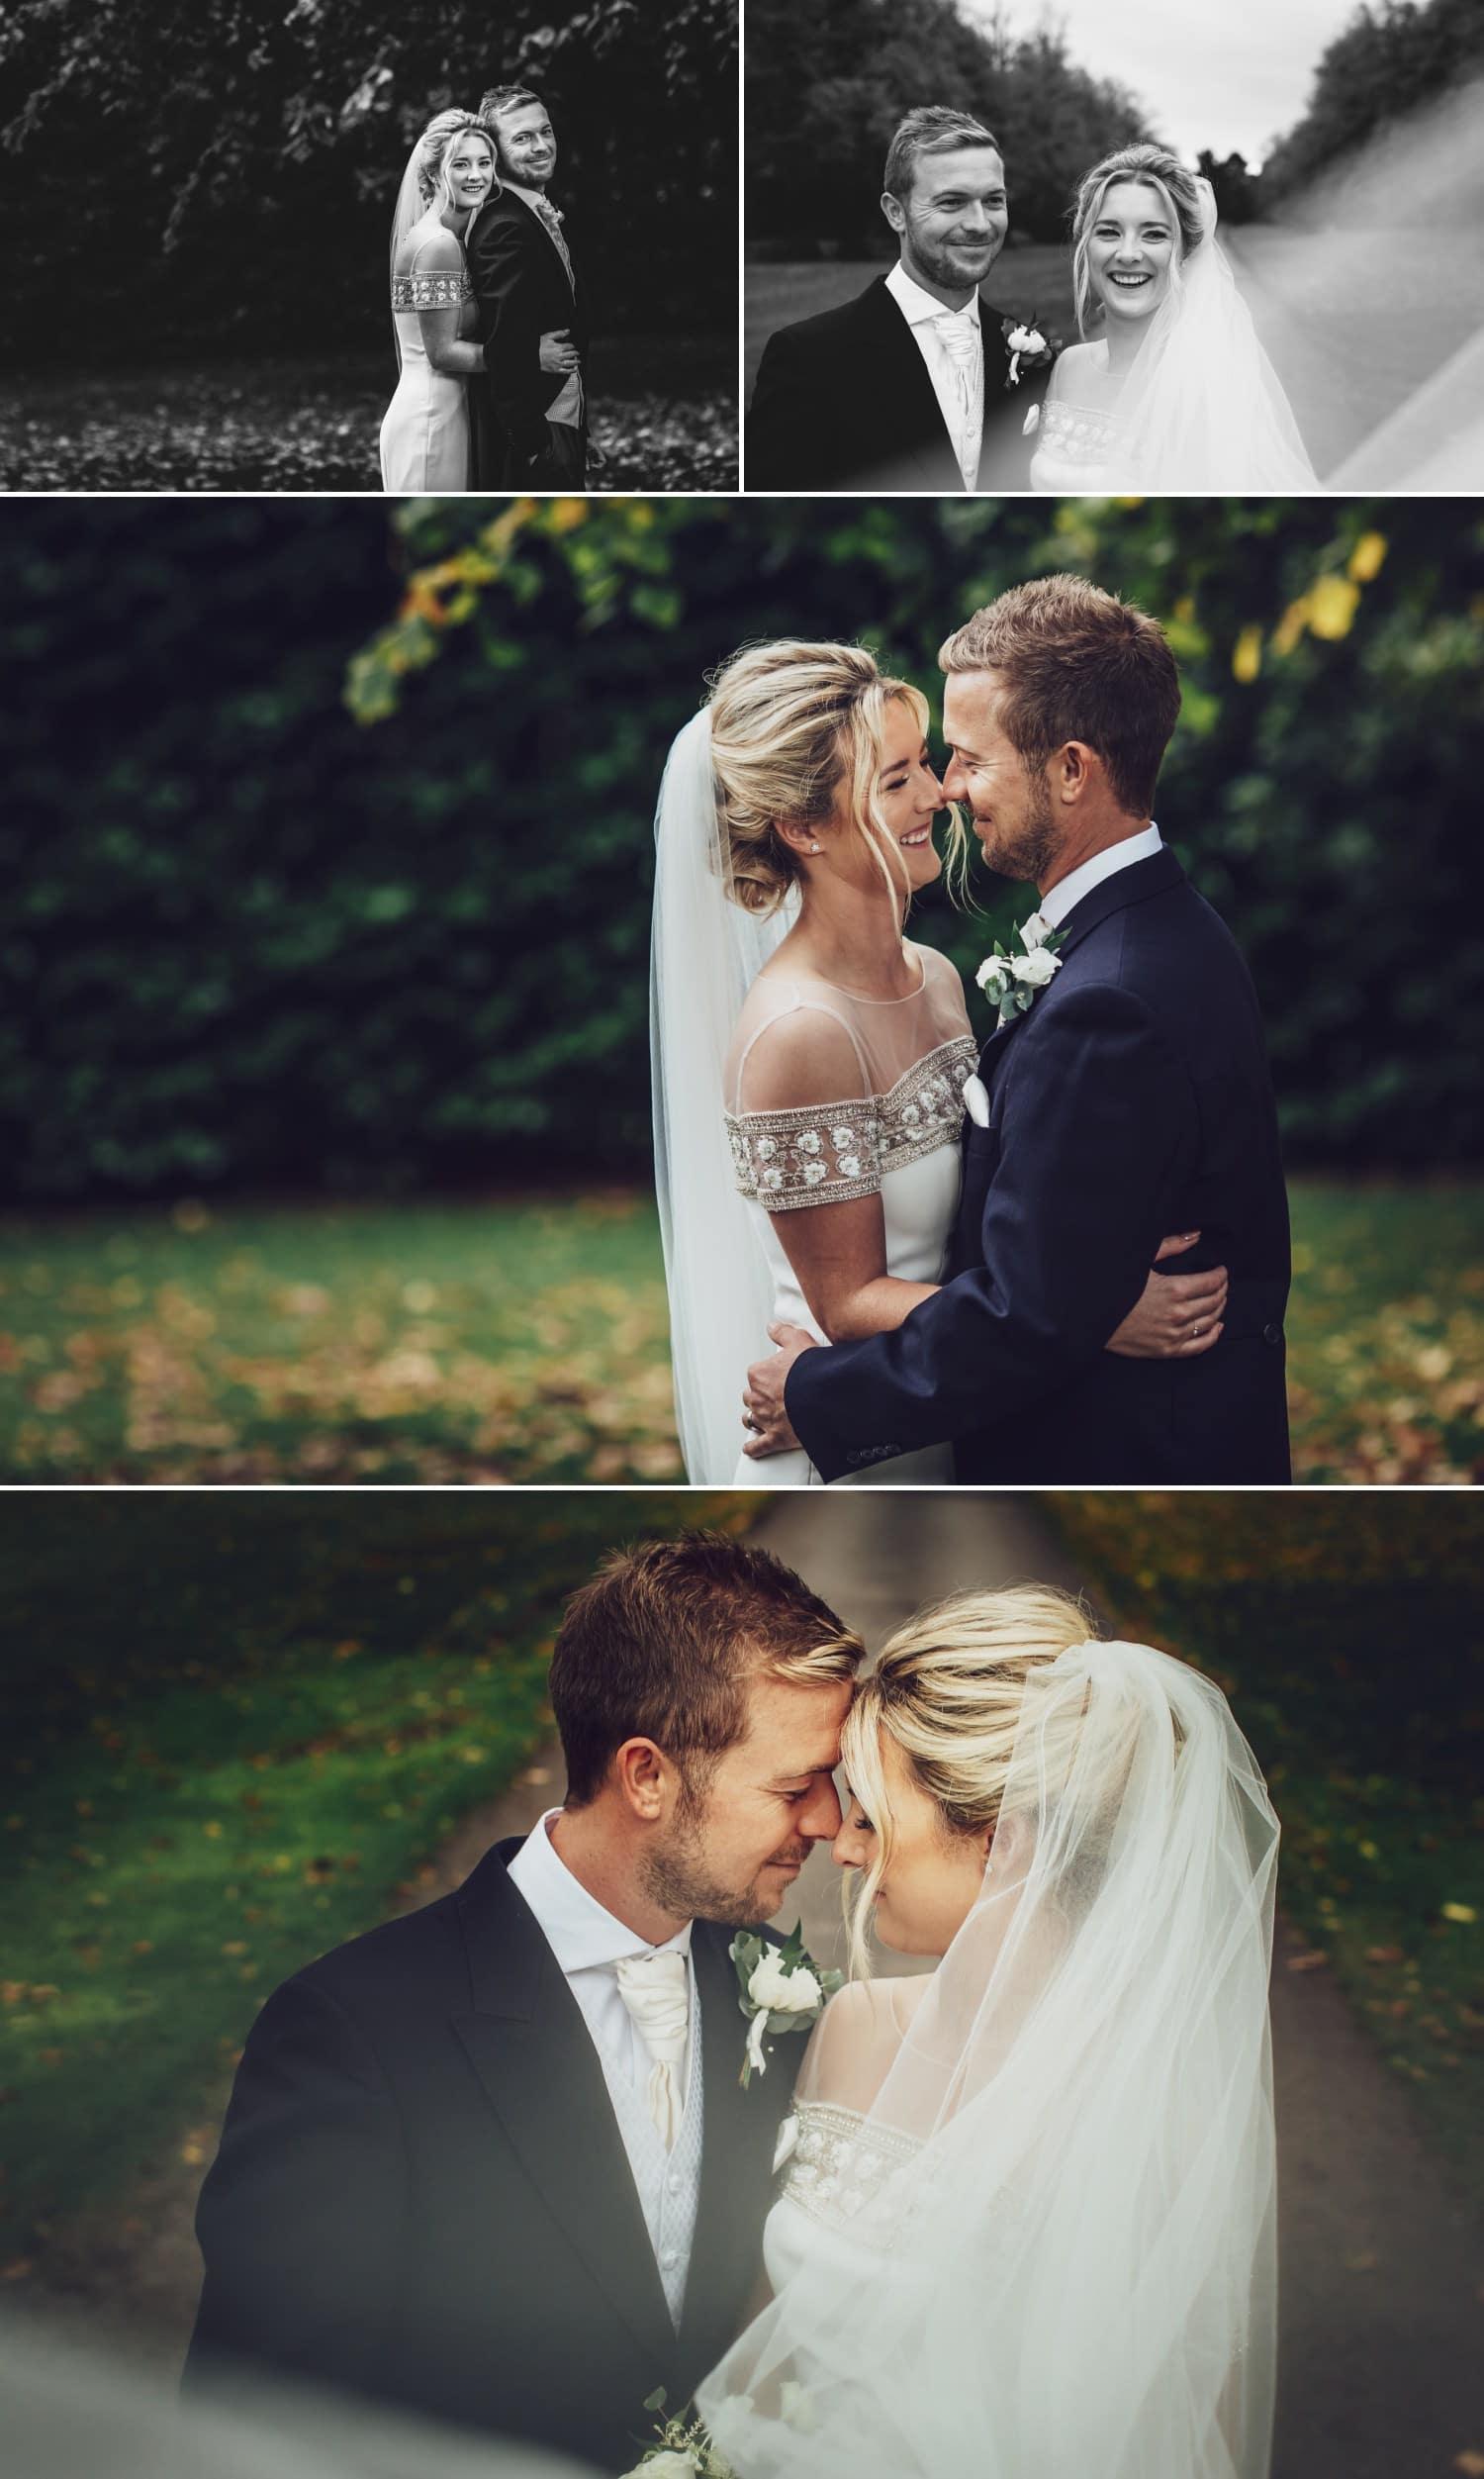 wedding photgraphy portraits of the couple at soughton hall